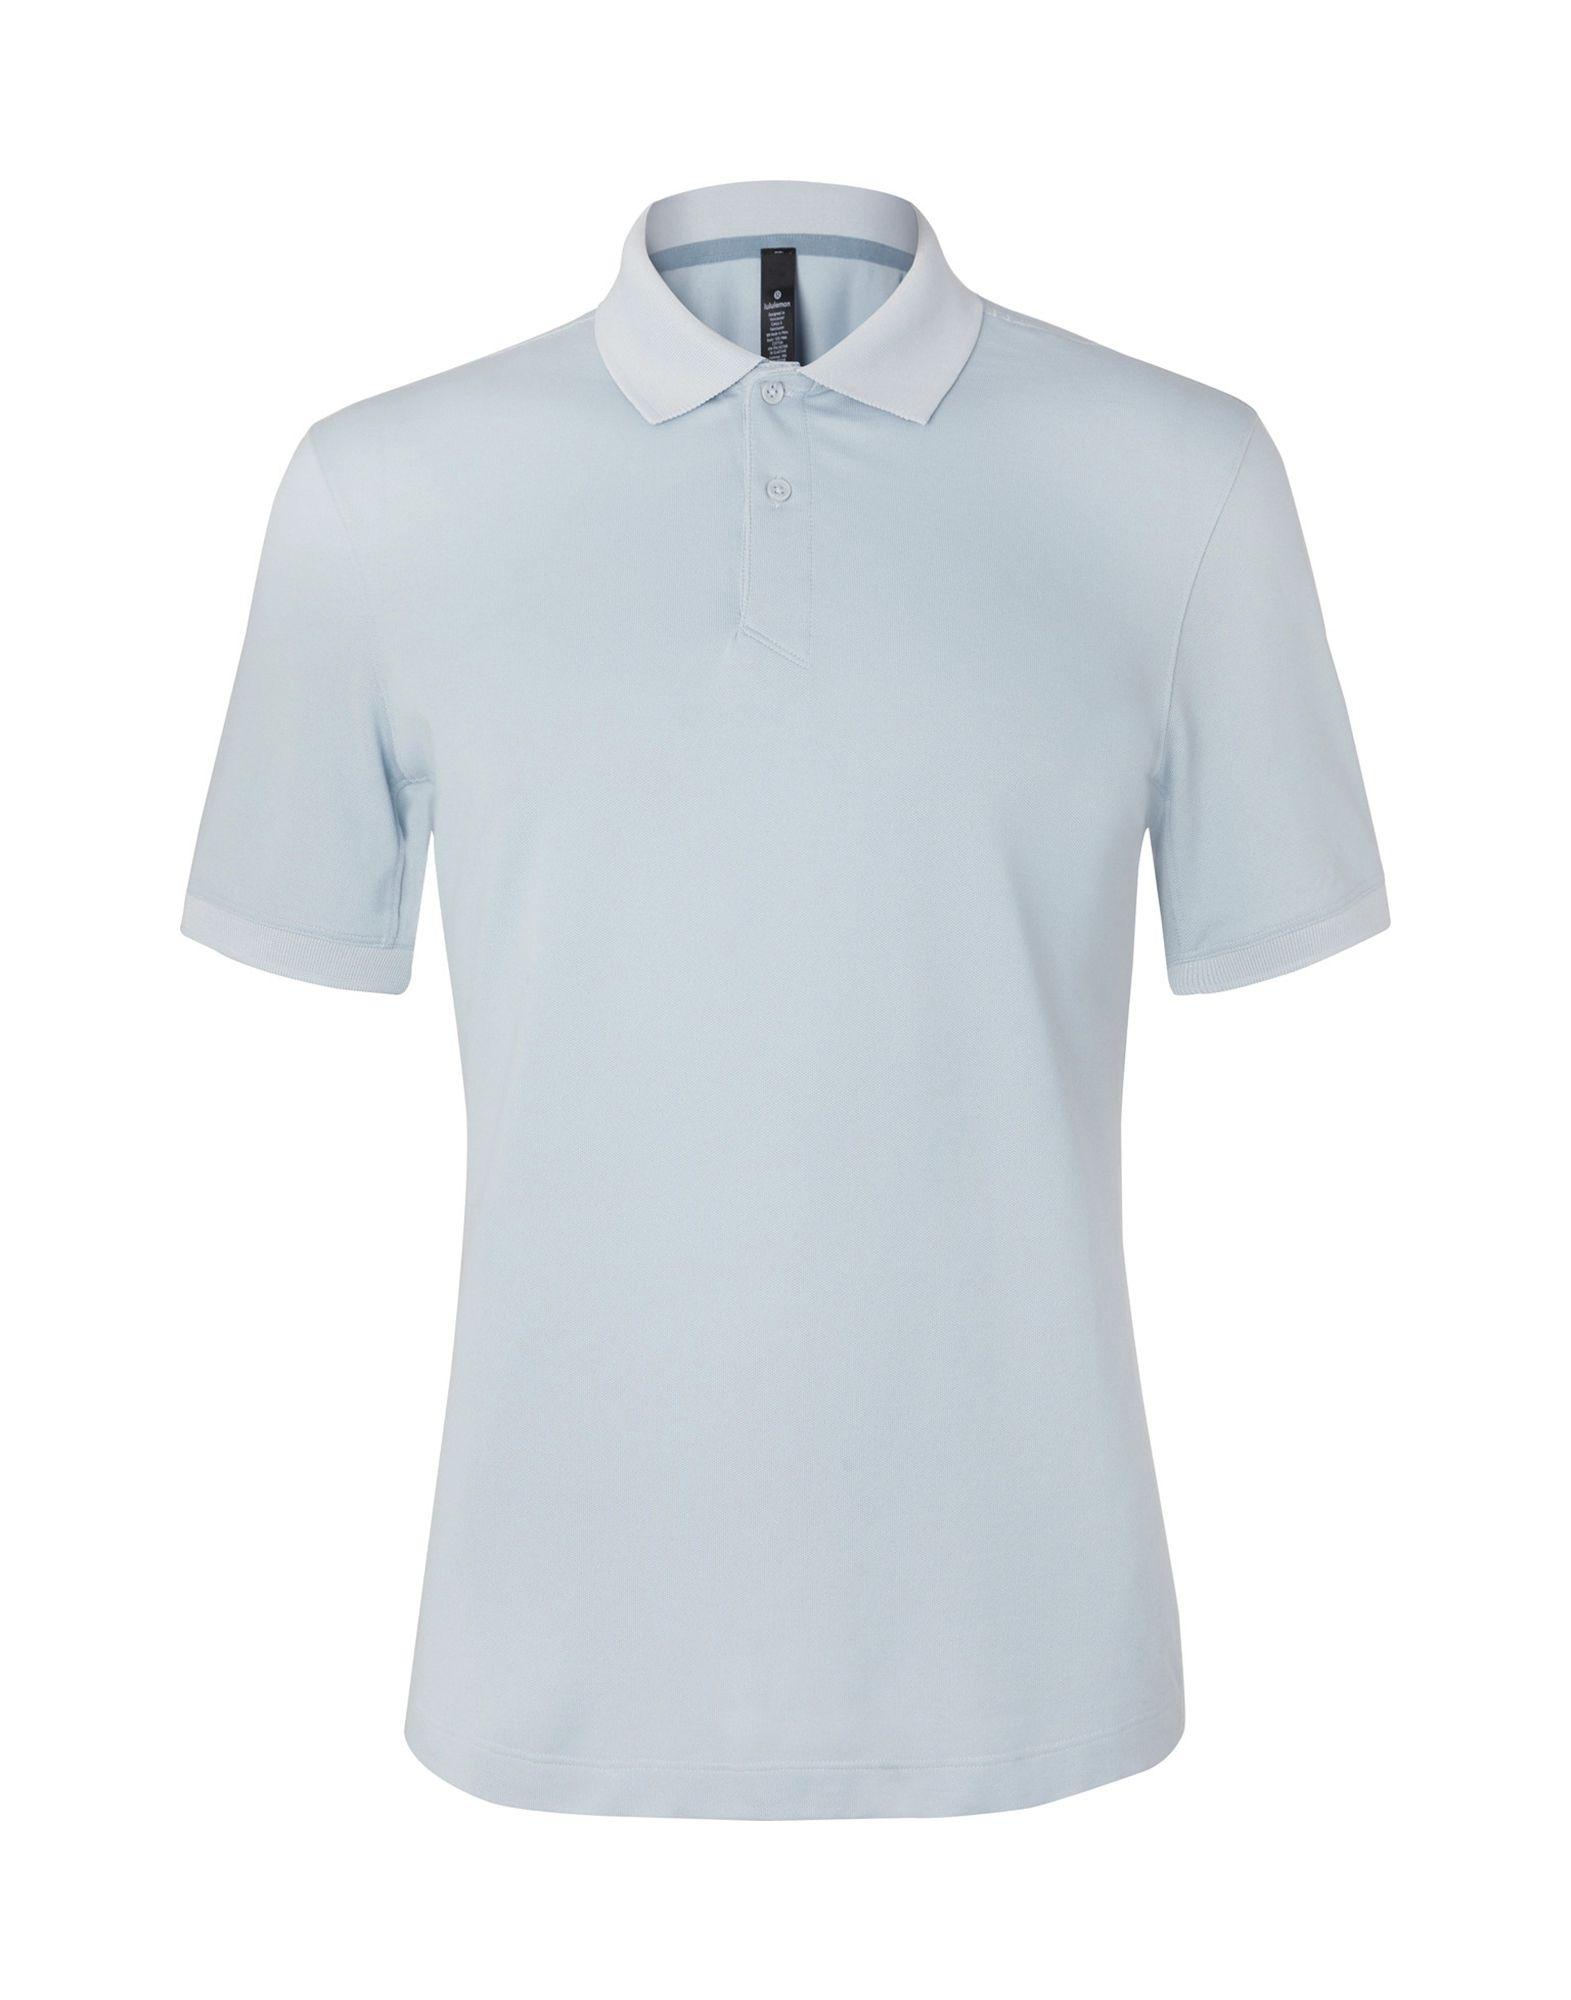 LULULEMON Polo shirts. piqué, no appliqués, basic solid color, polo collar, short sleeves, no pockets, stretch. 52% Supima Cotton, 45% Polyester, 3% Elastane